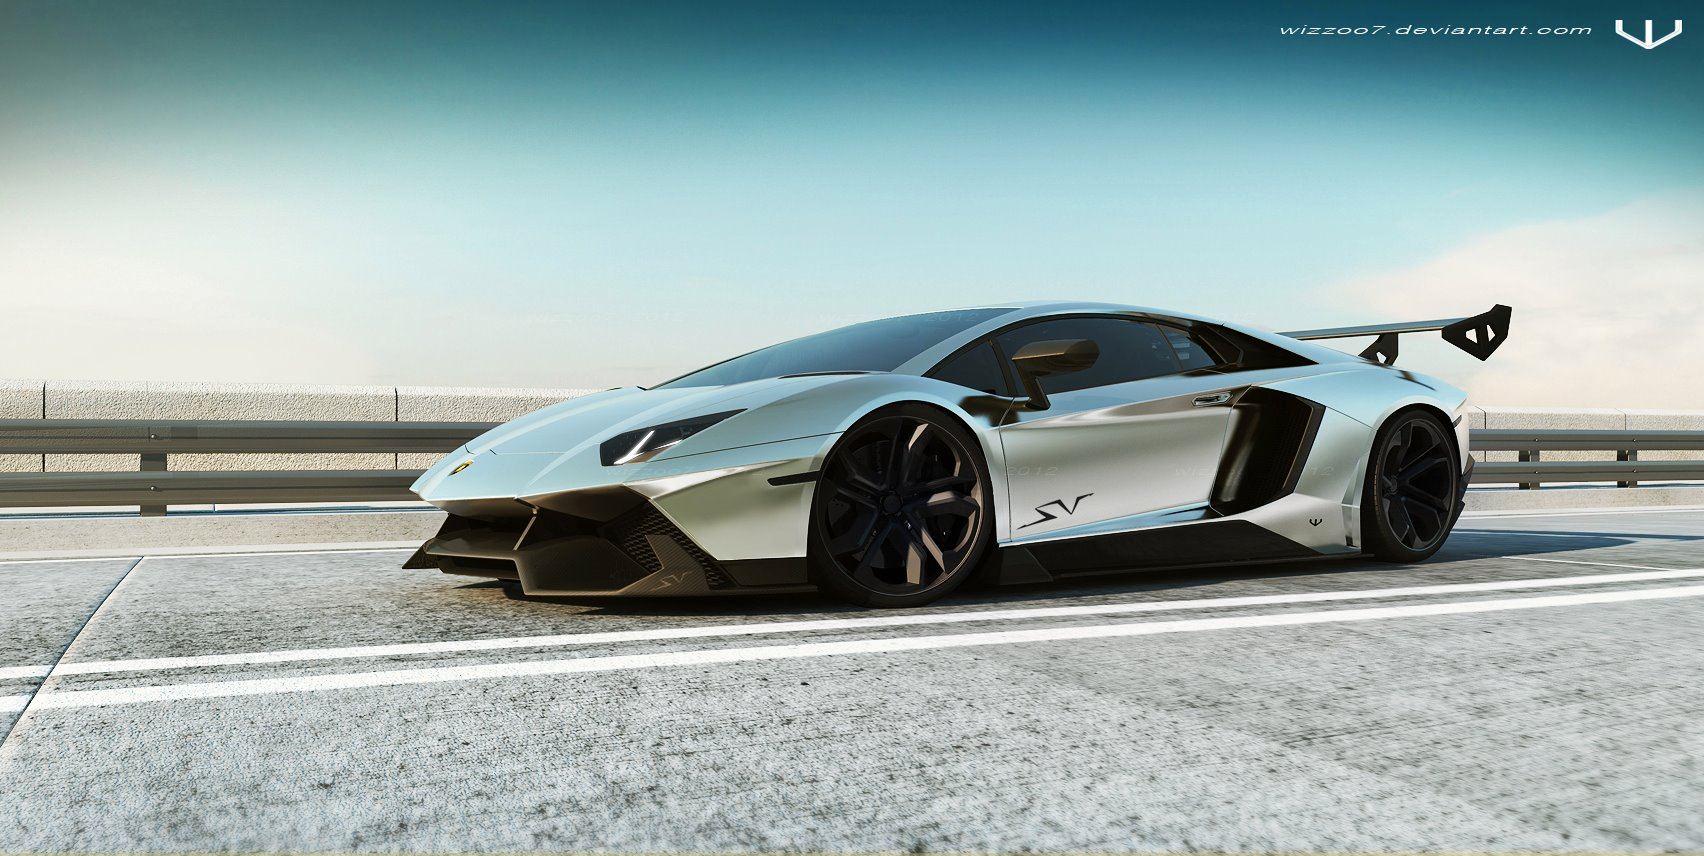 Lamborghini Dealers Taking Waiting List Deposits For Aventador Sv Autoevolution